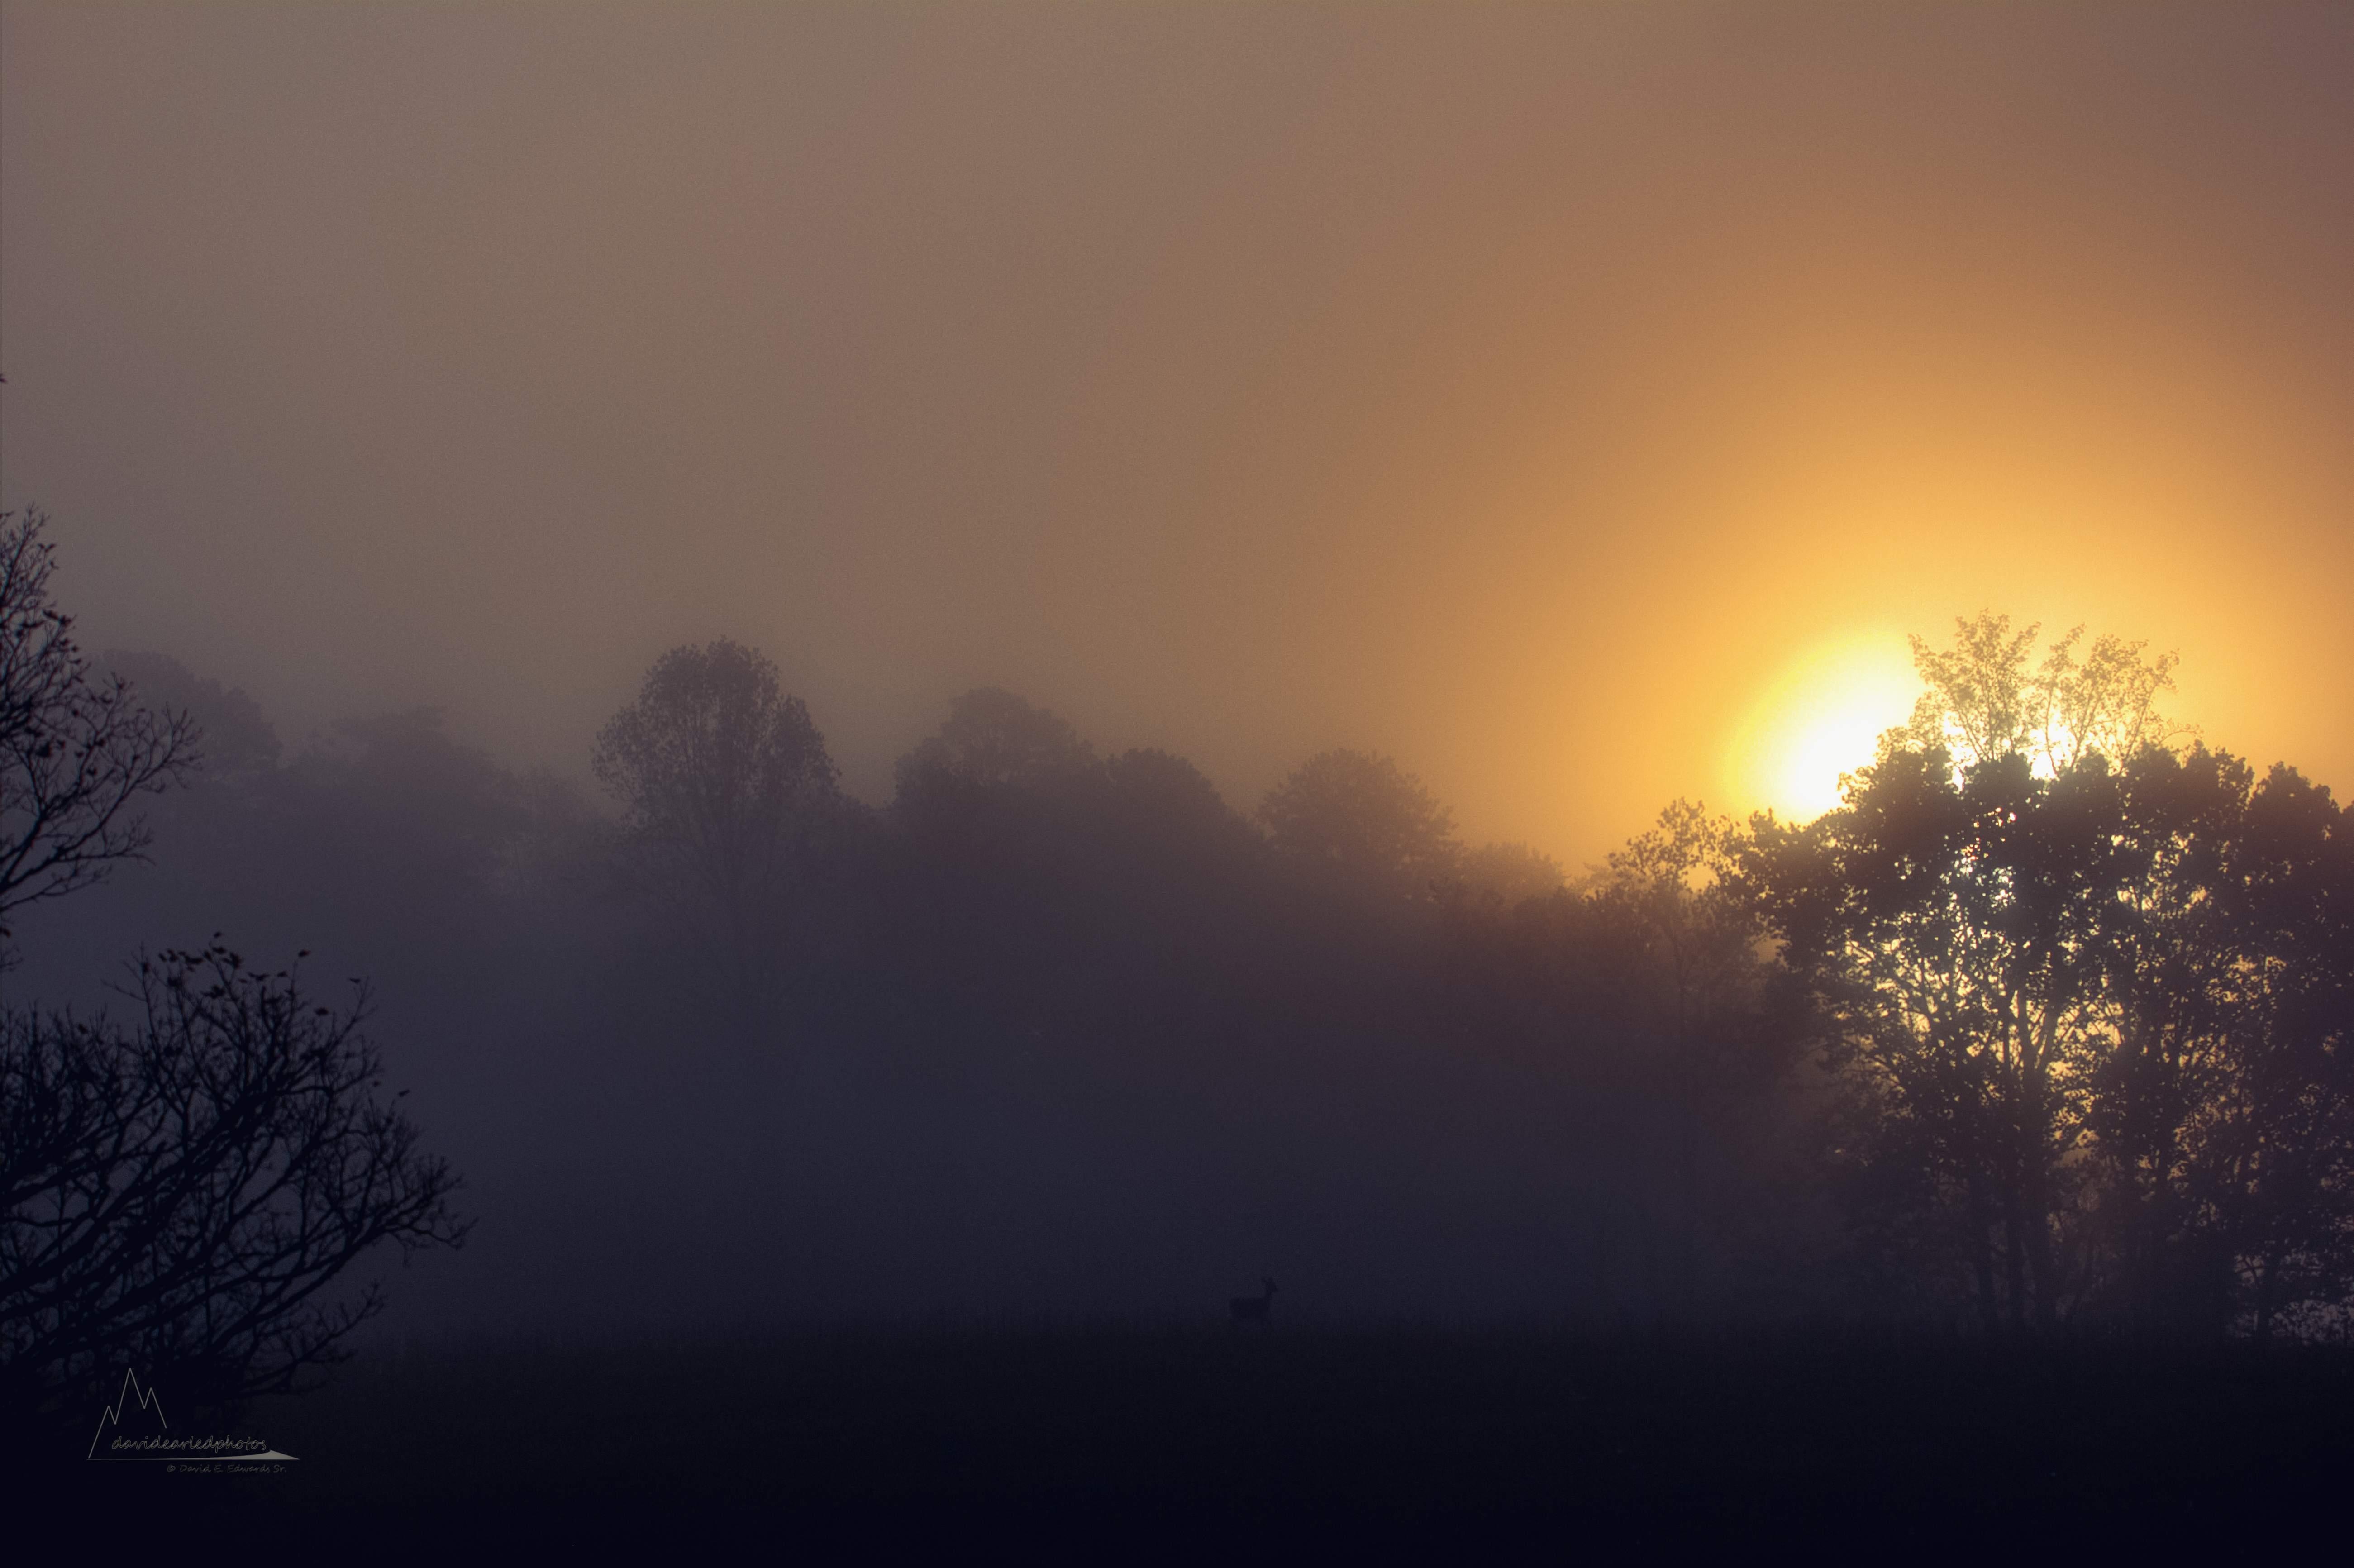 A very foggy Cades Cove morning